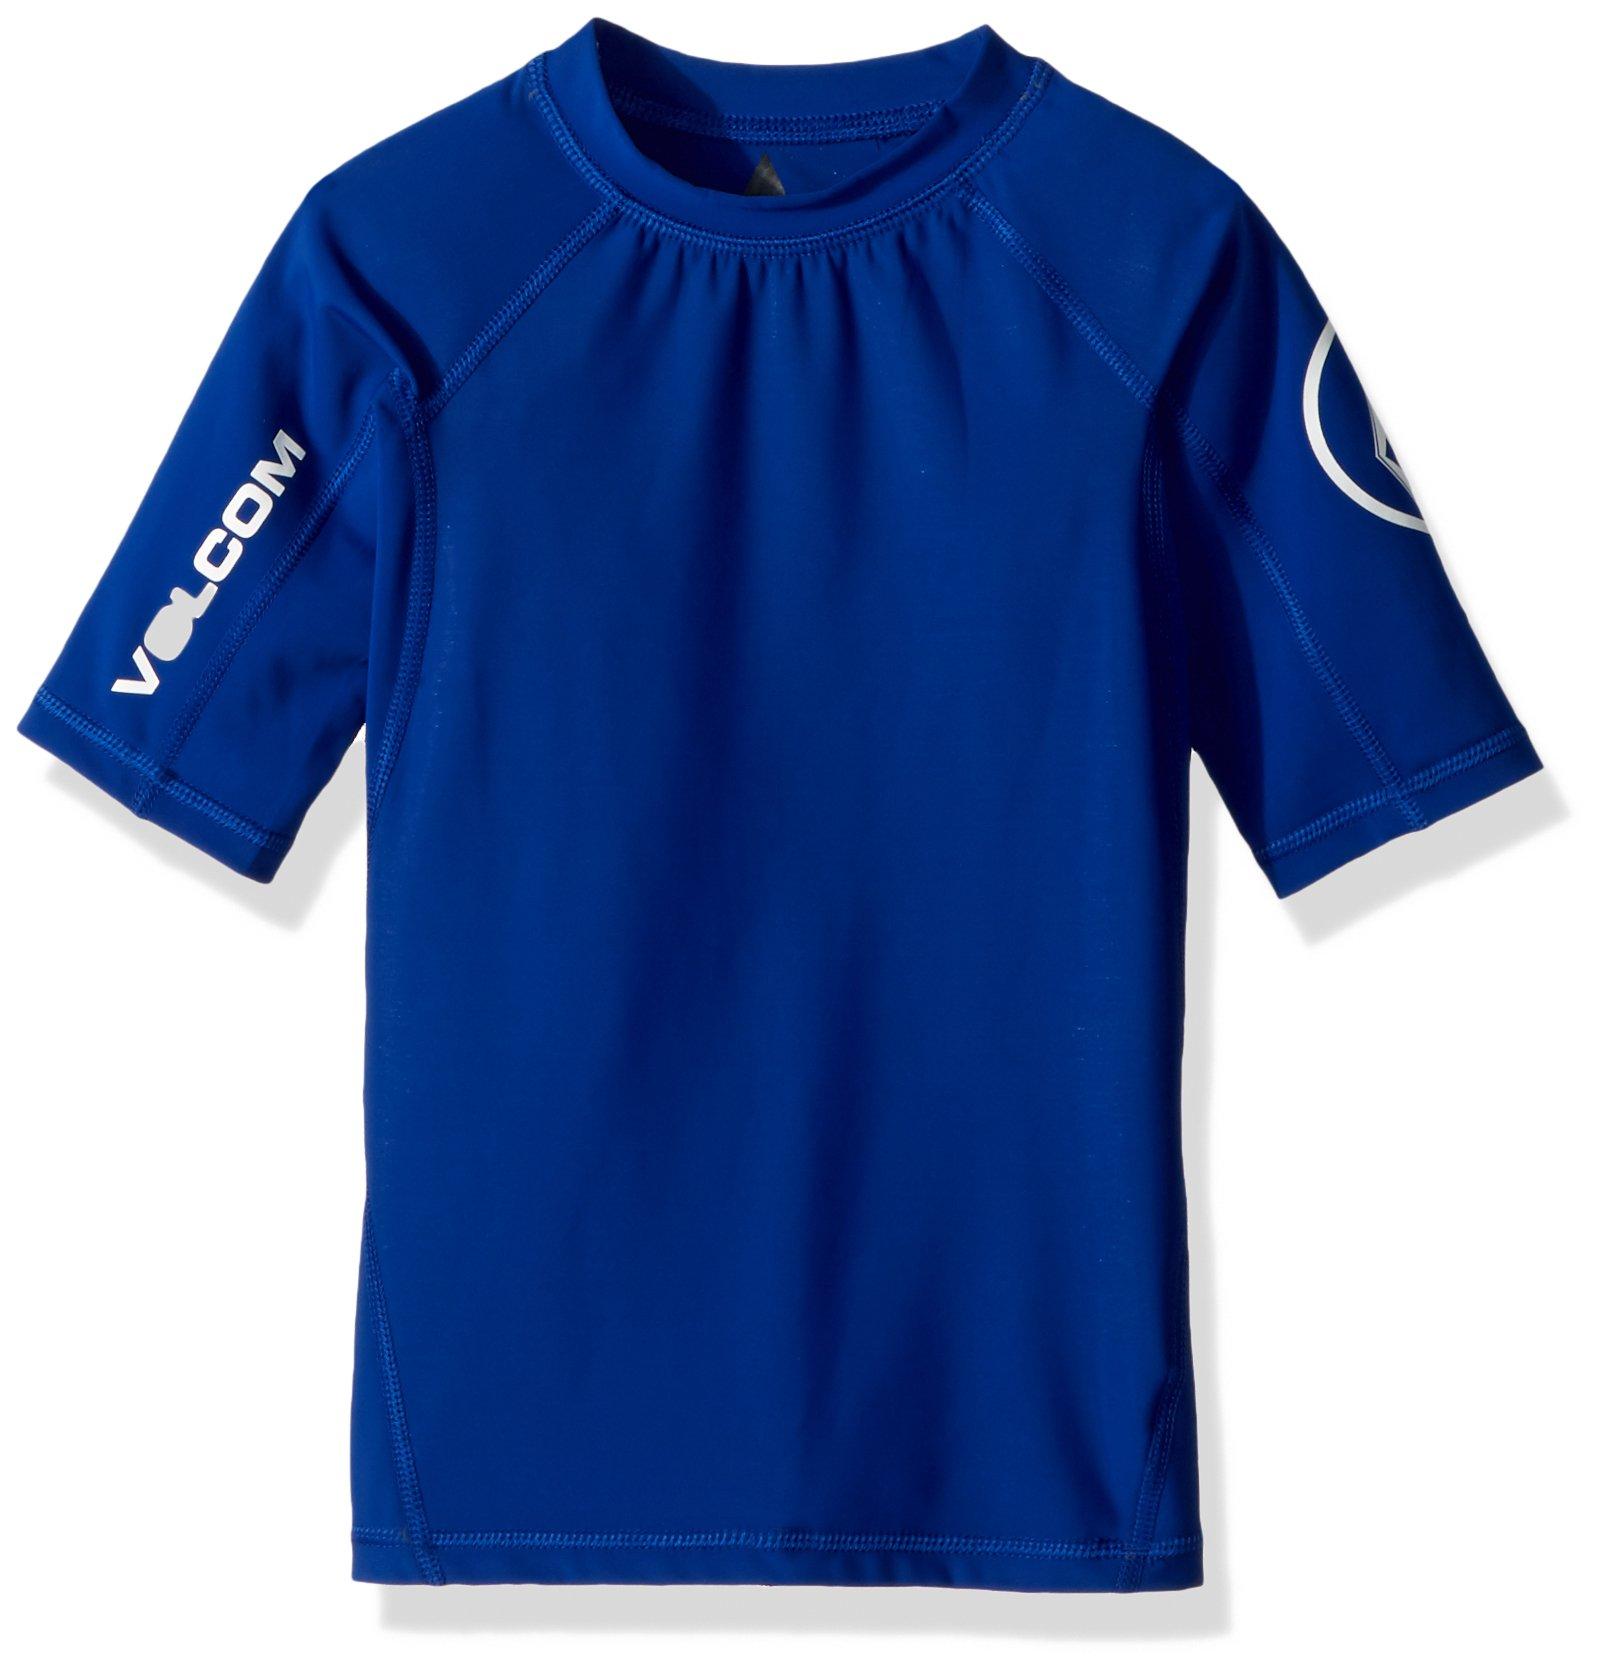 Volcom Big Boys' Lido Solid Short Sleeve Rashguard, Camper Blue, M